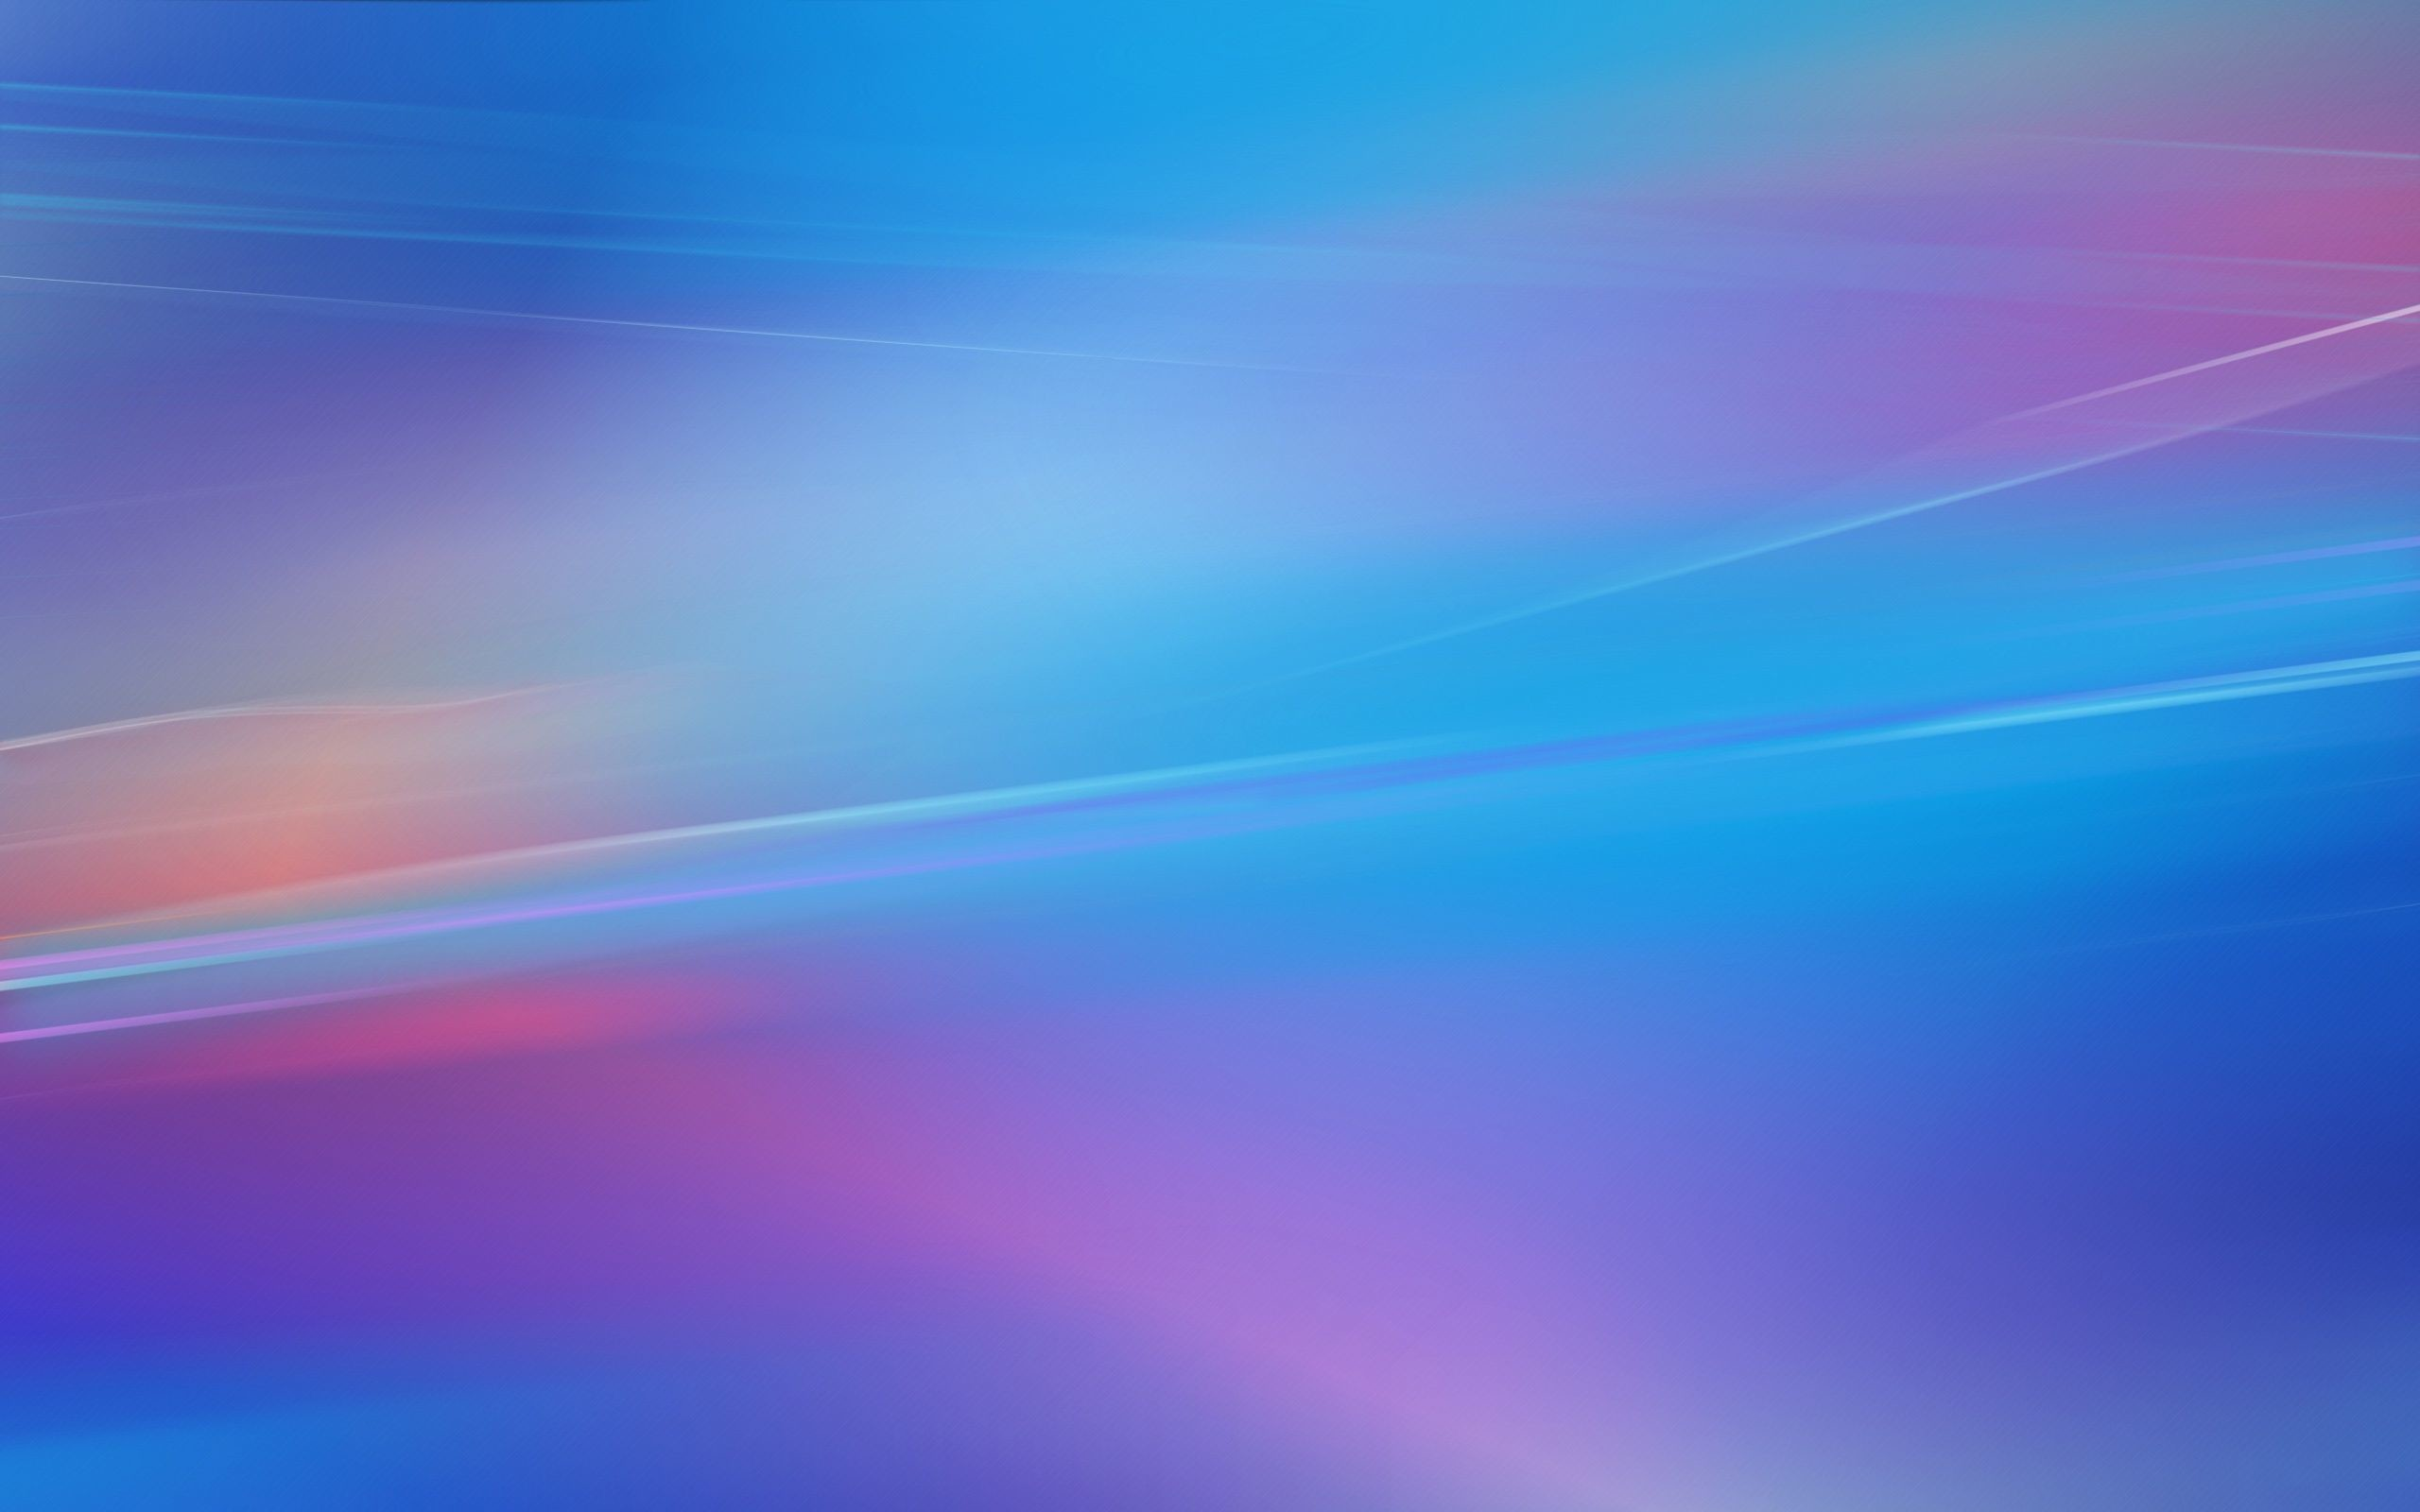 Solid Color Wallpaper – HD Wallpapers Pretty